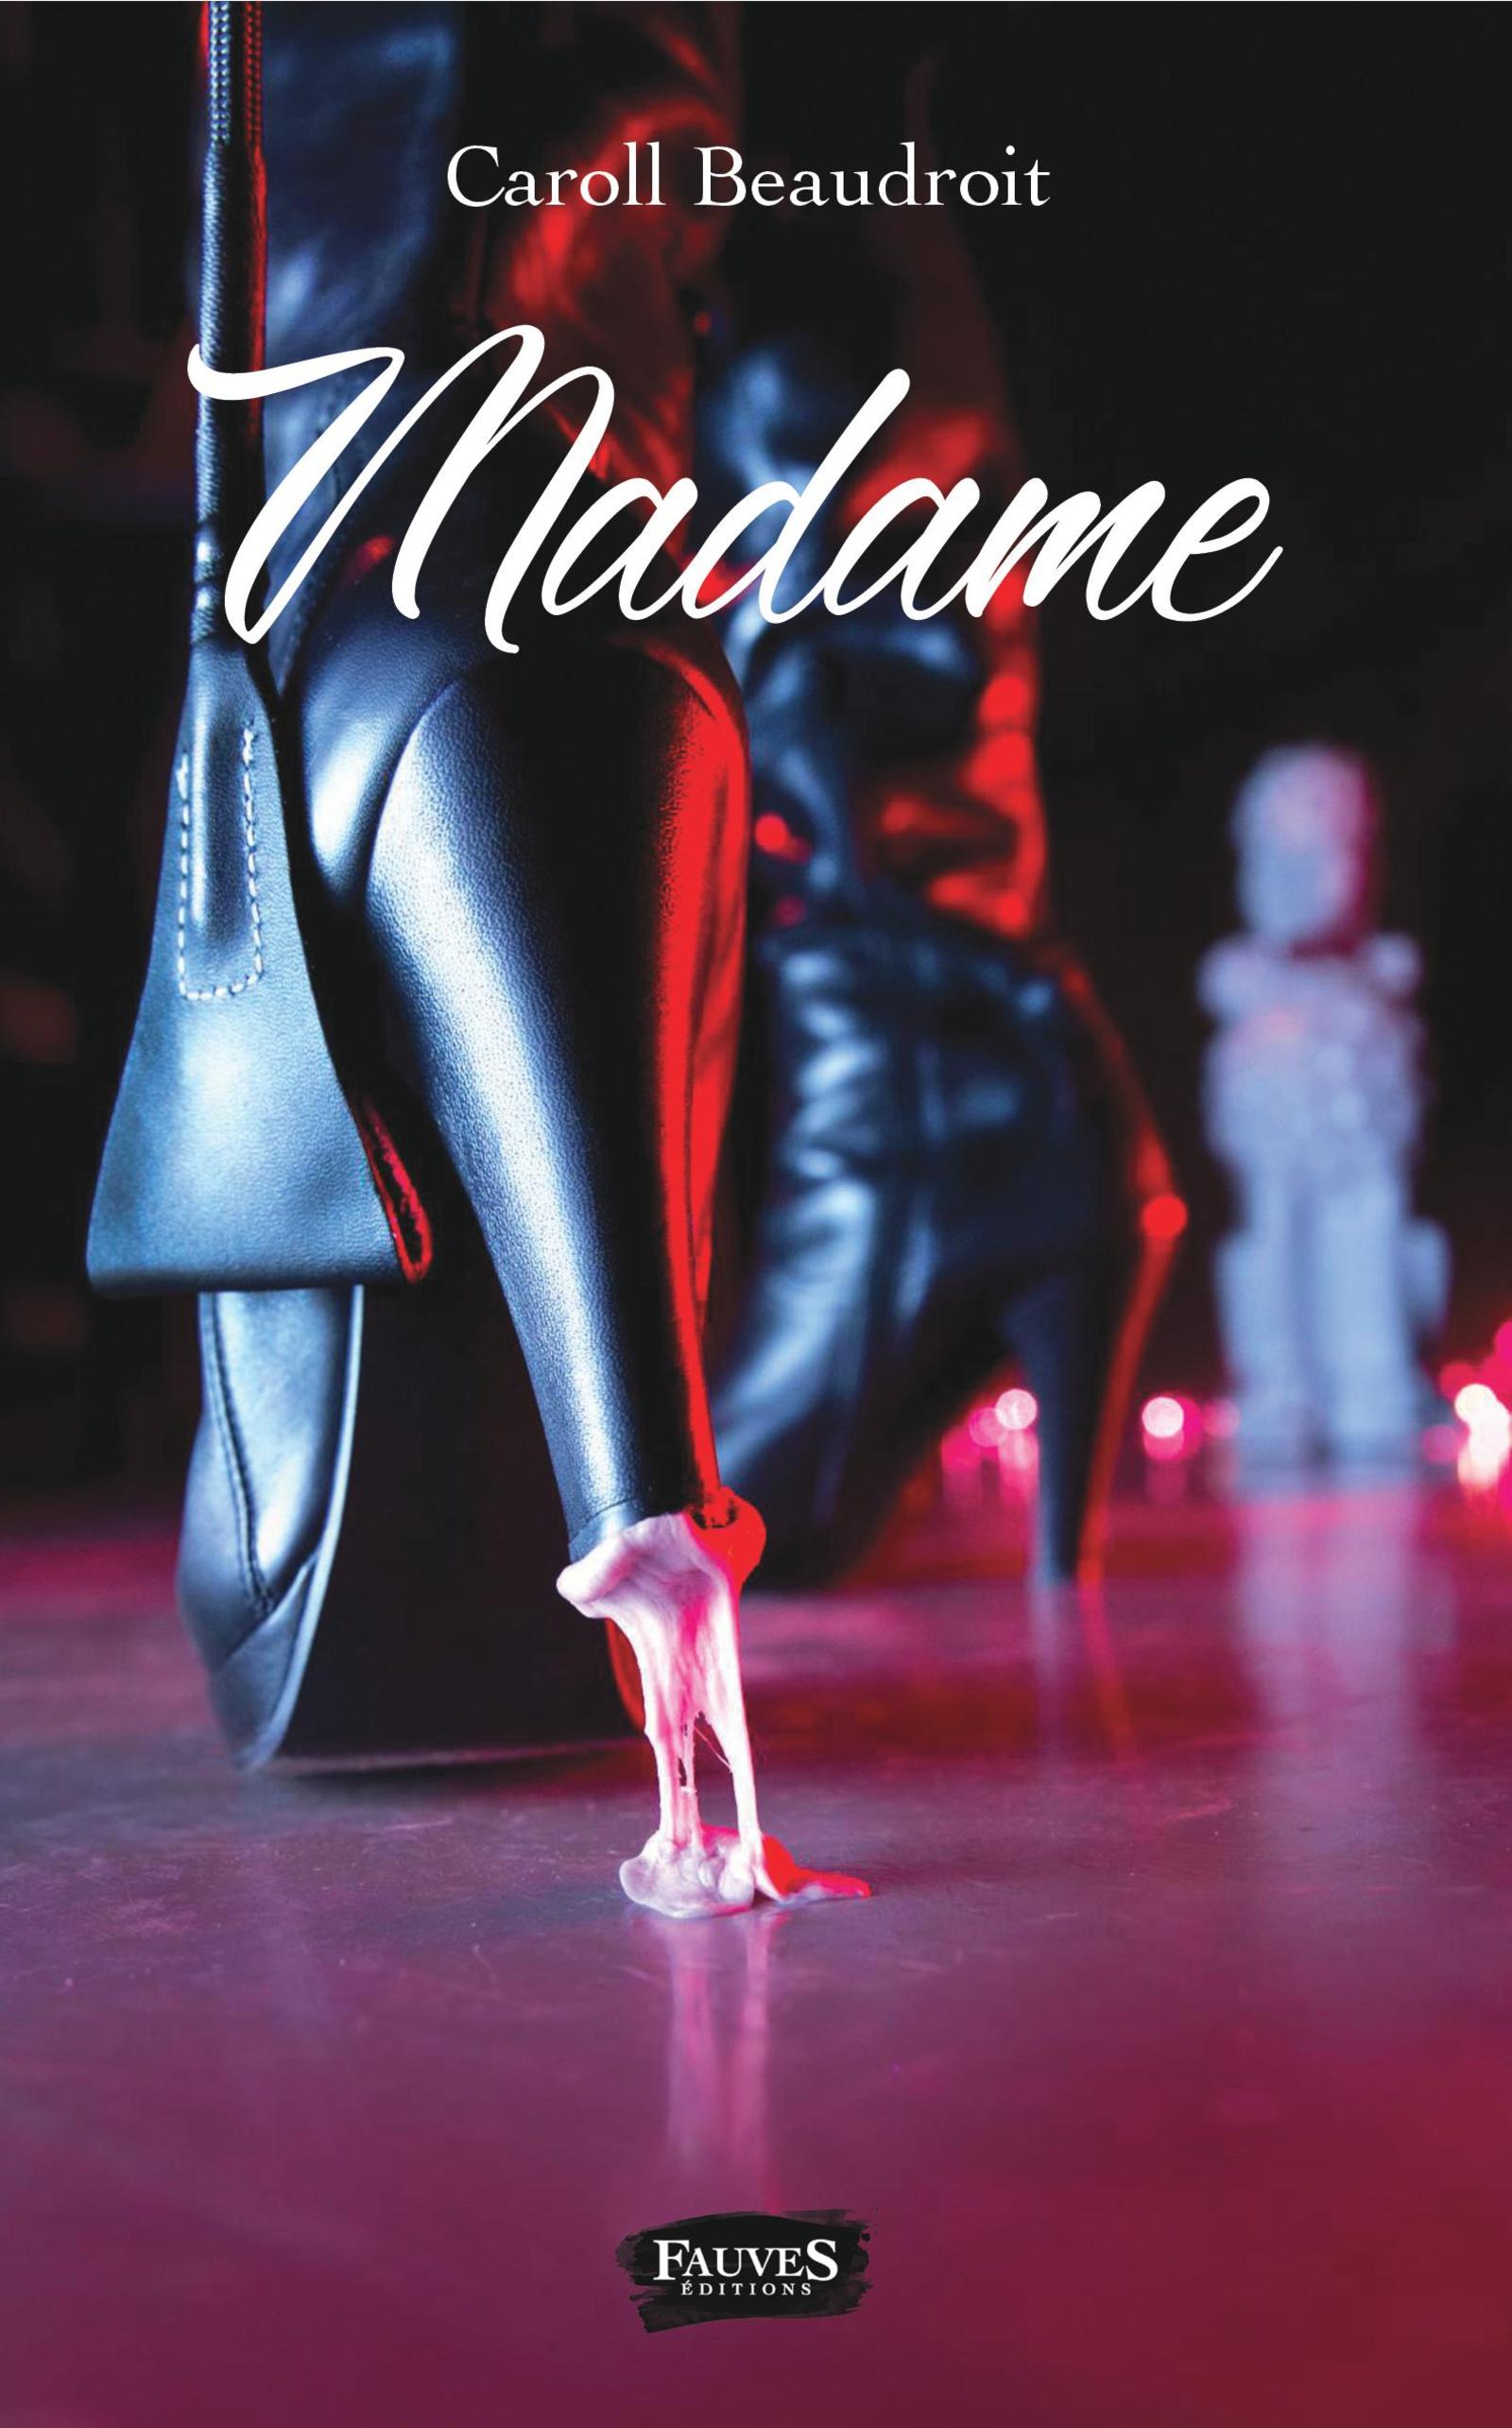 MADAME, Caroll Beaudroit - Comédie BDSM - livre, ebook, epub 3189a913f81